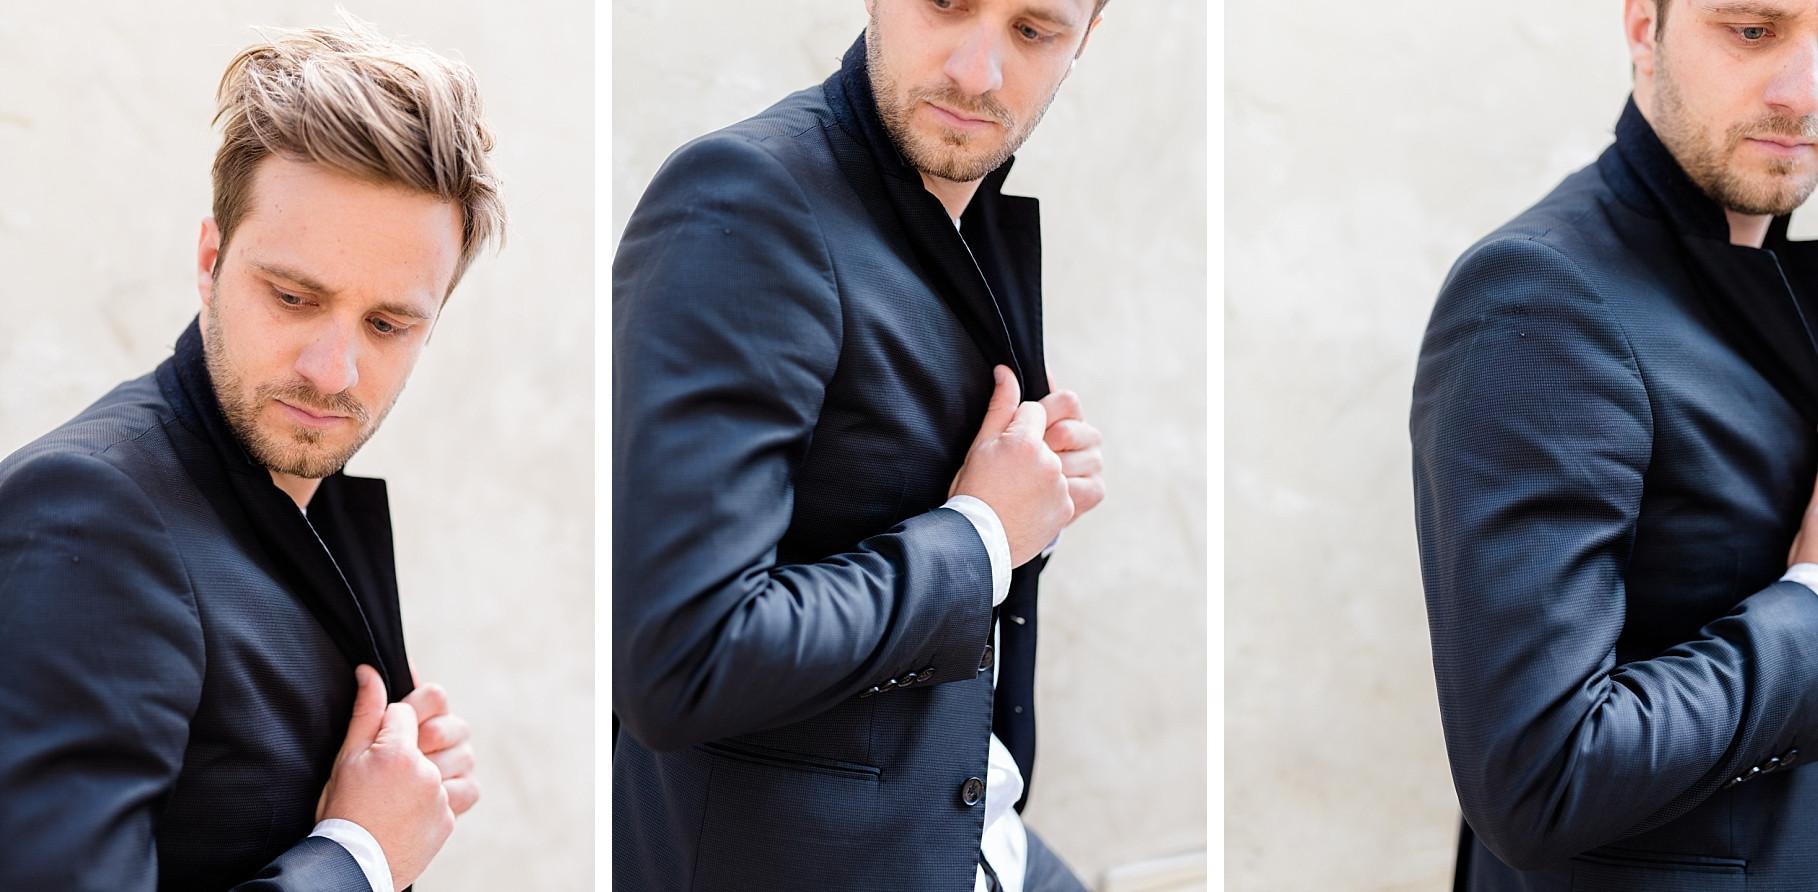 photographe-editorial-mode-corporate-lifestyle-var-paca-provence-brignoles